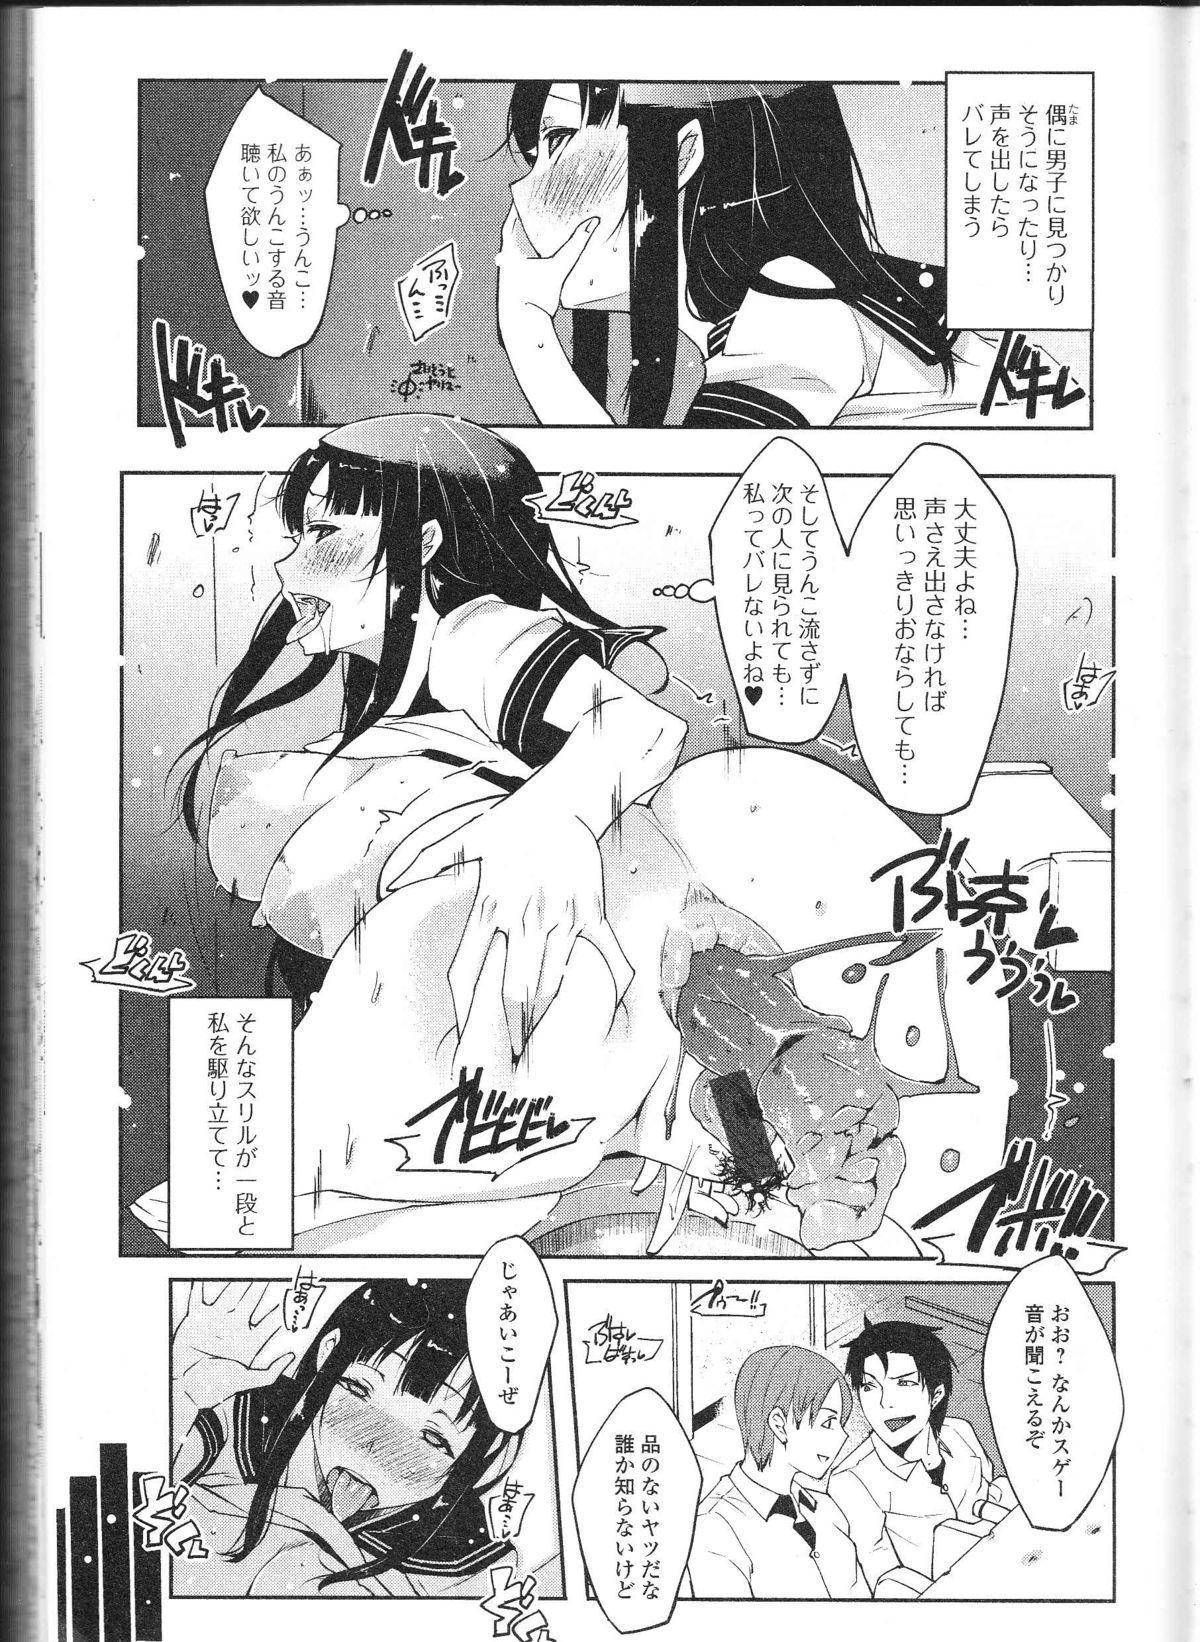 Nozoite wa Ikenai 9 - Do Not Peep! 9 69